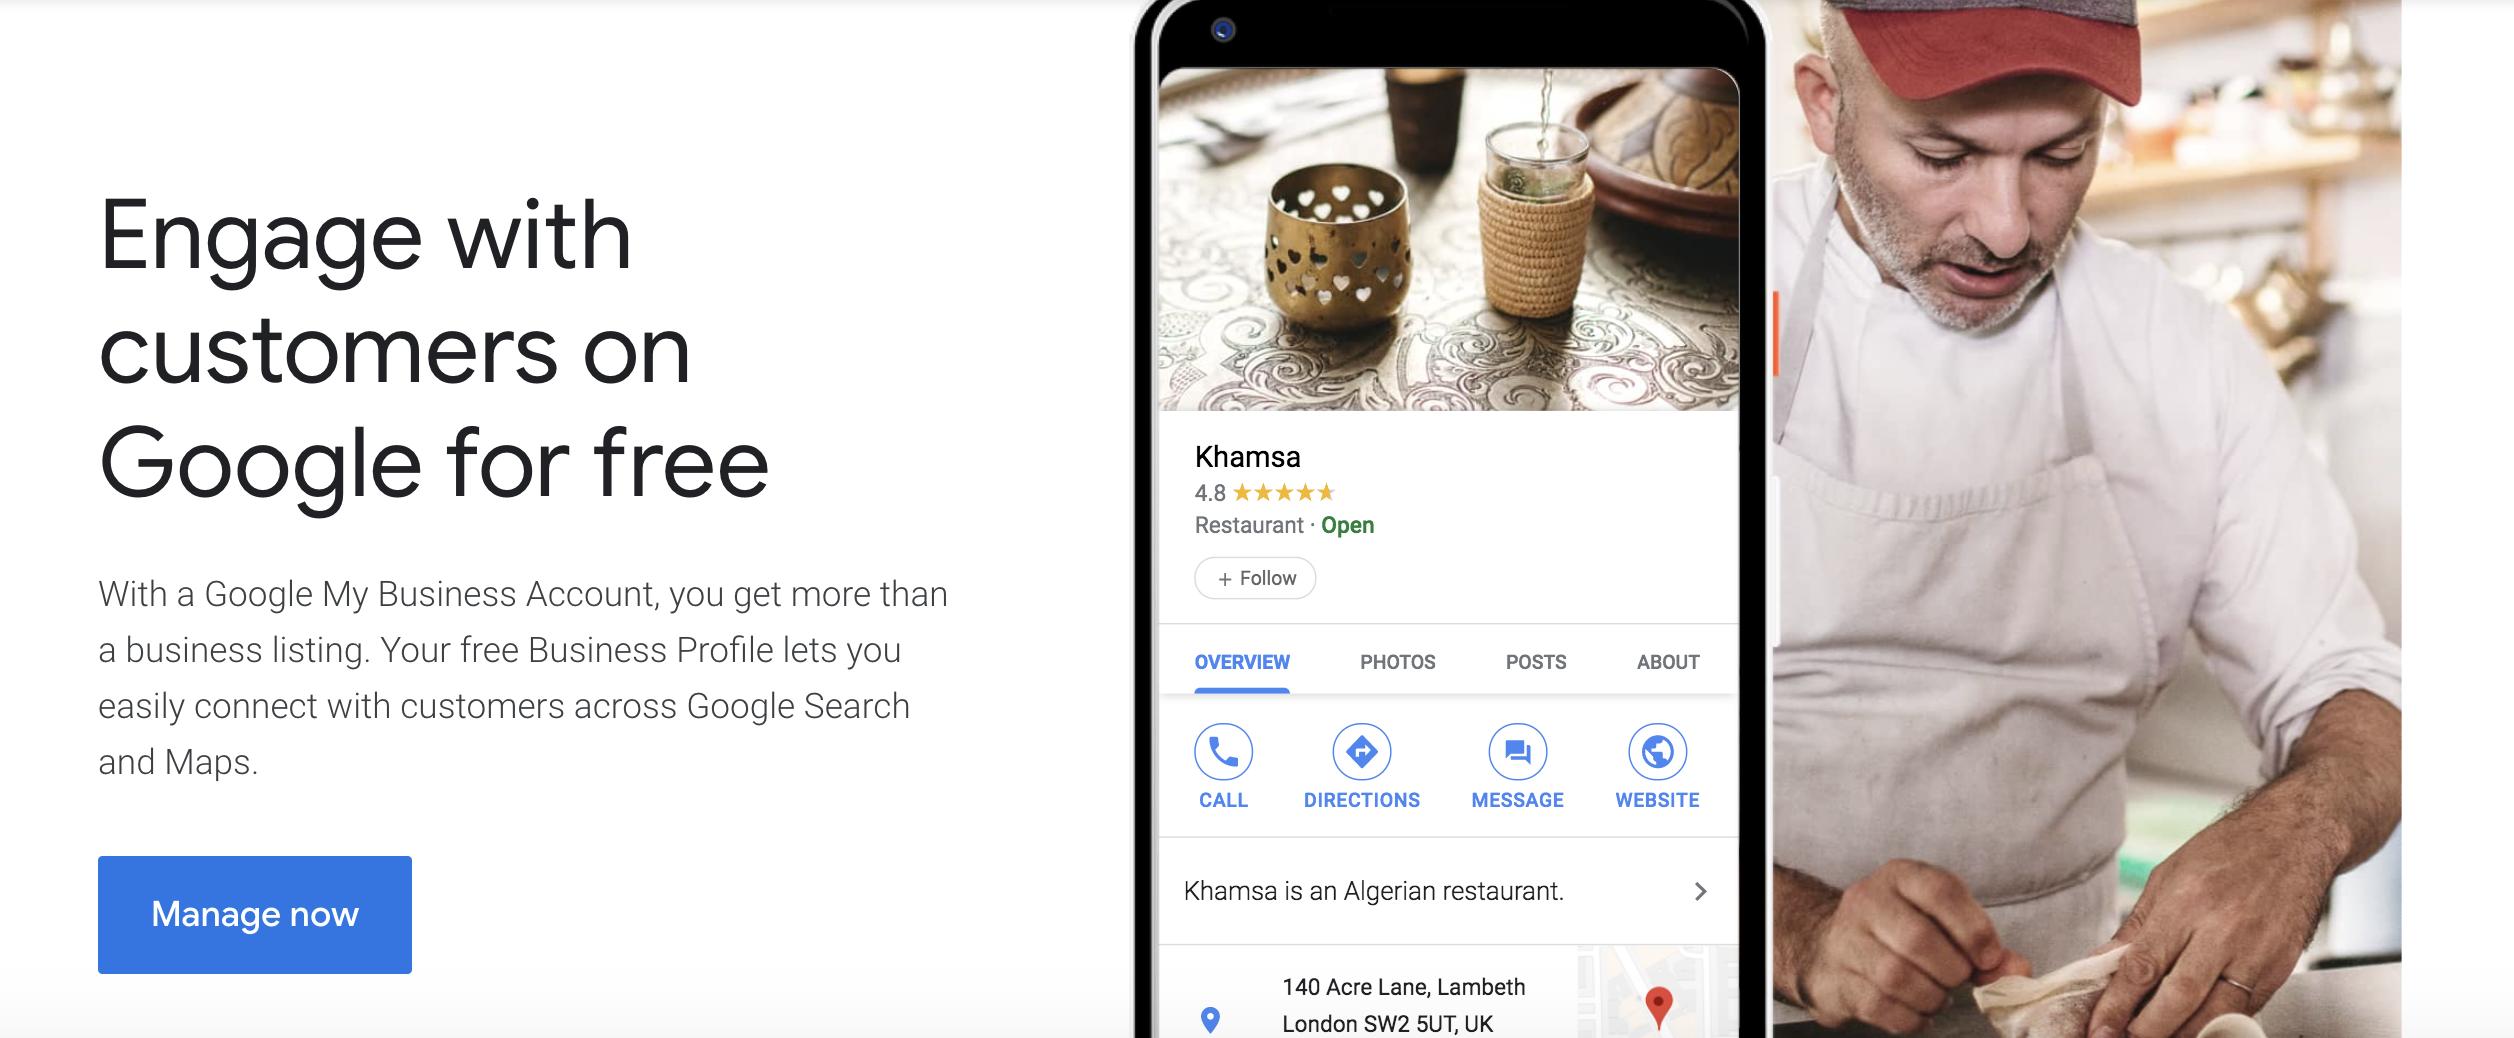 Google My Business (GMB)